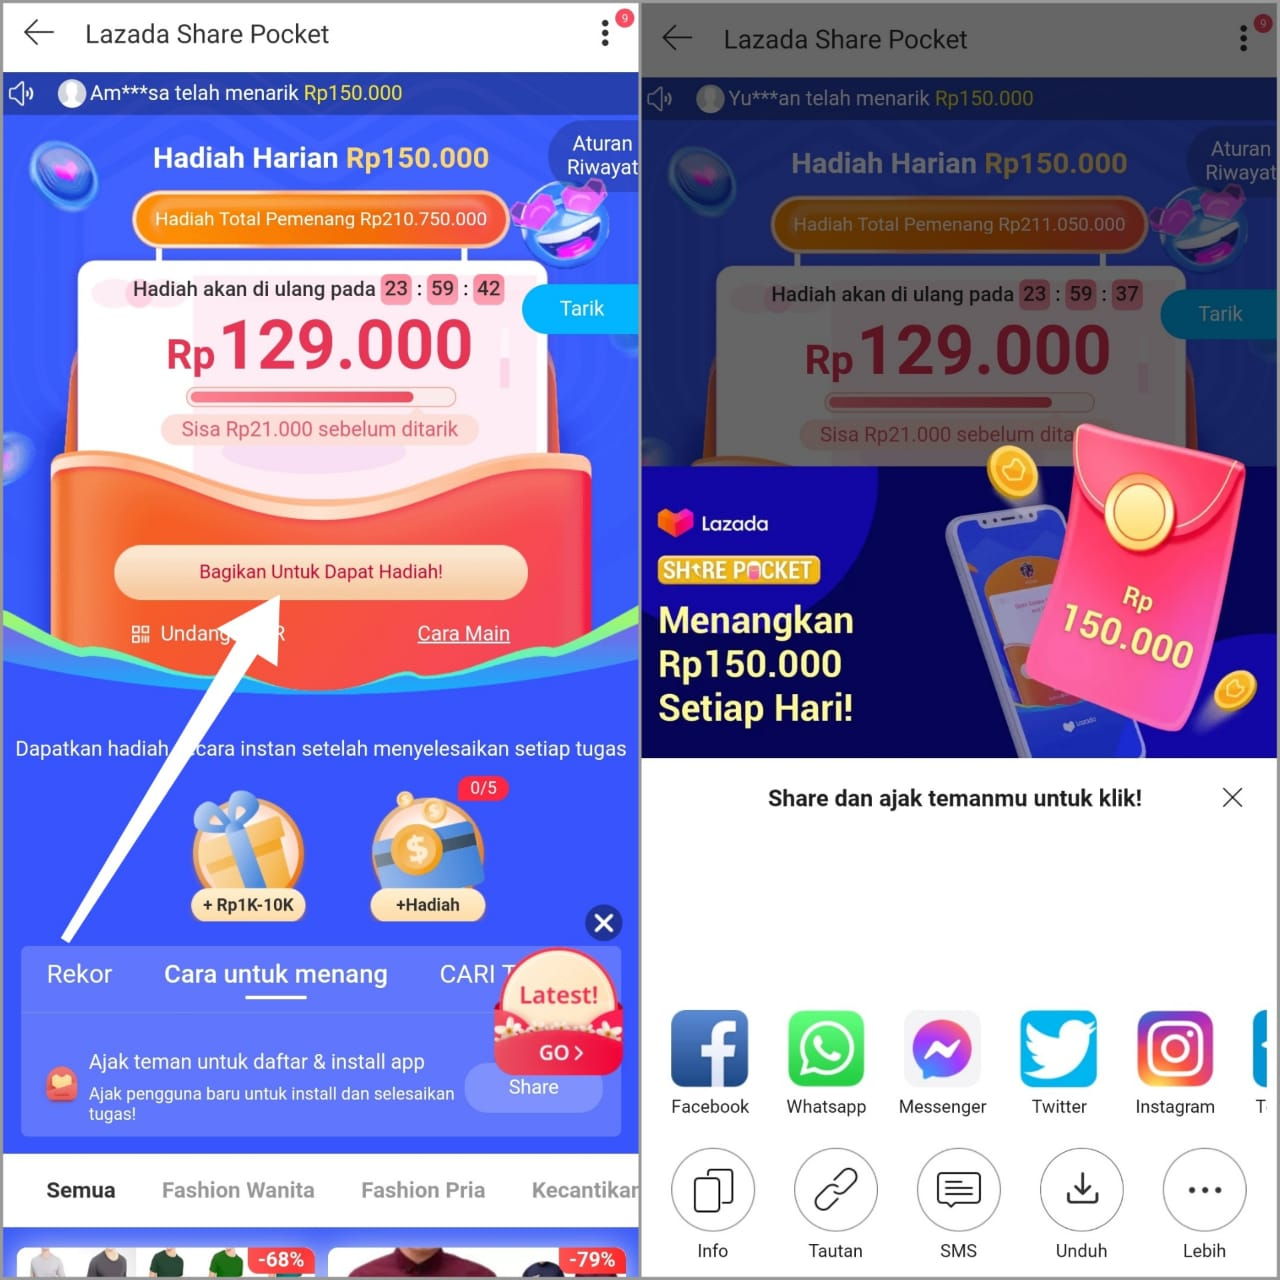 Cara Main Lazada Share Pocket dan Mendapatkan 150k